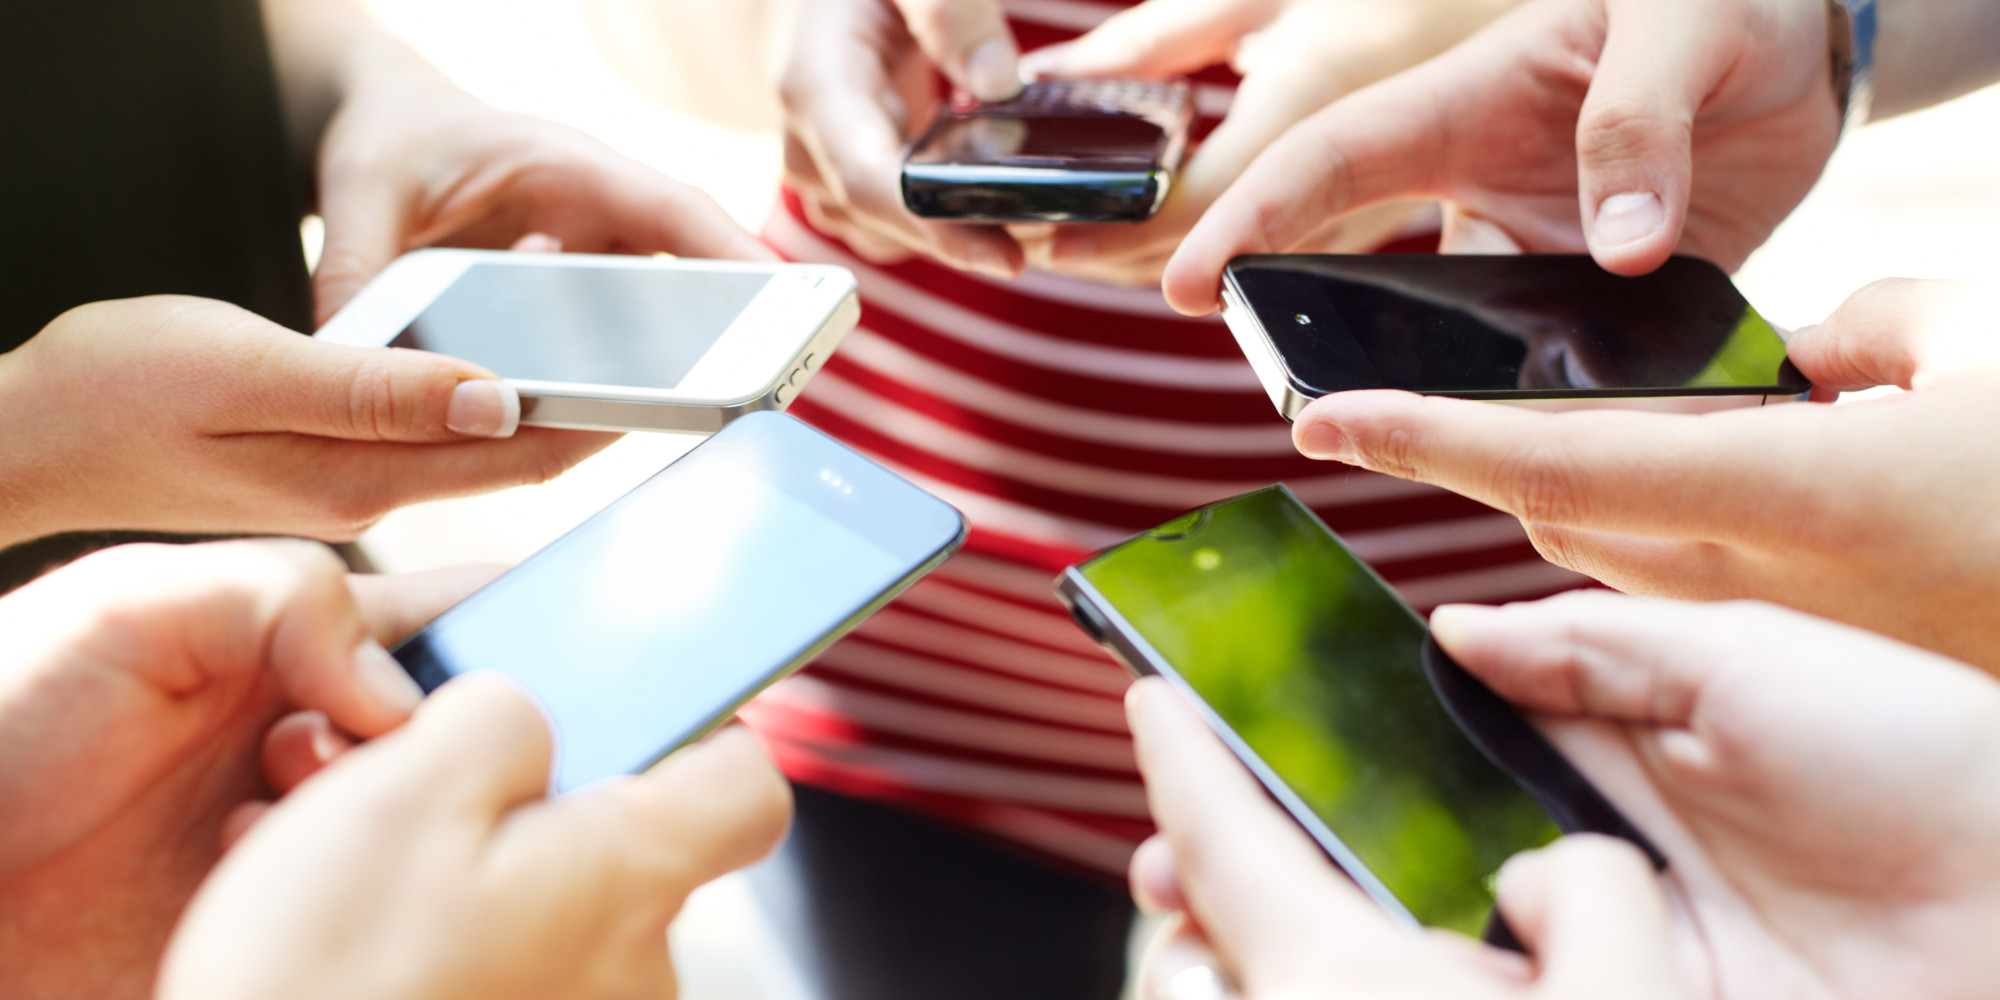 smartphone social depressione